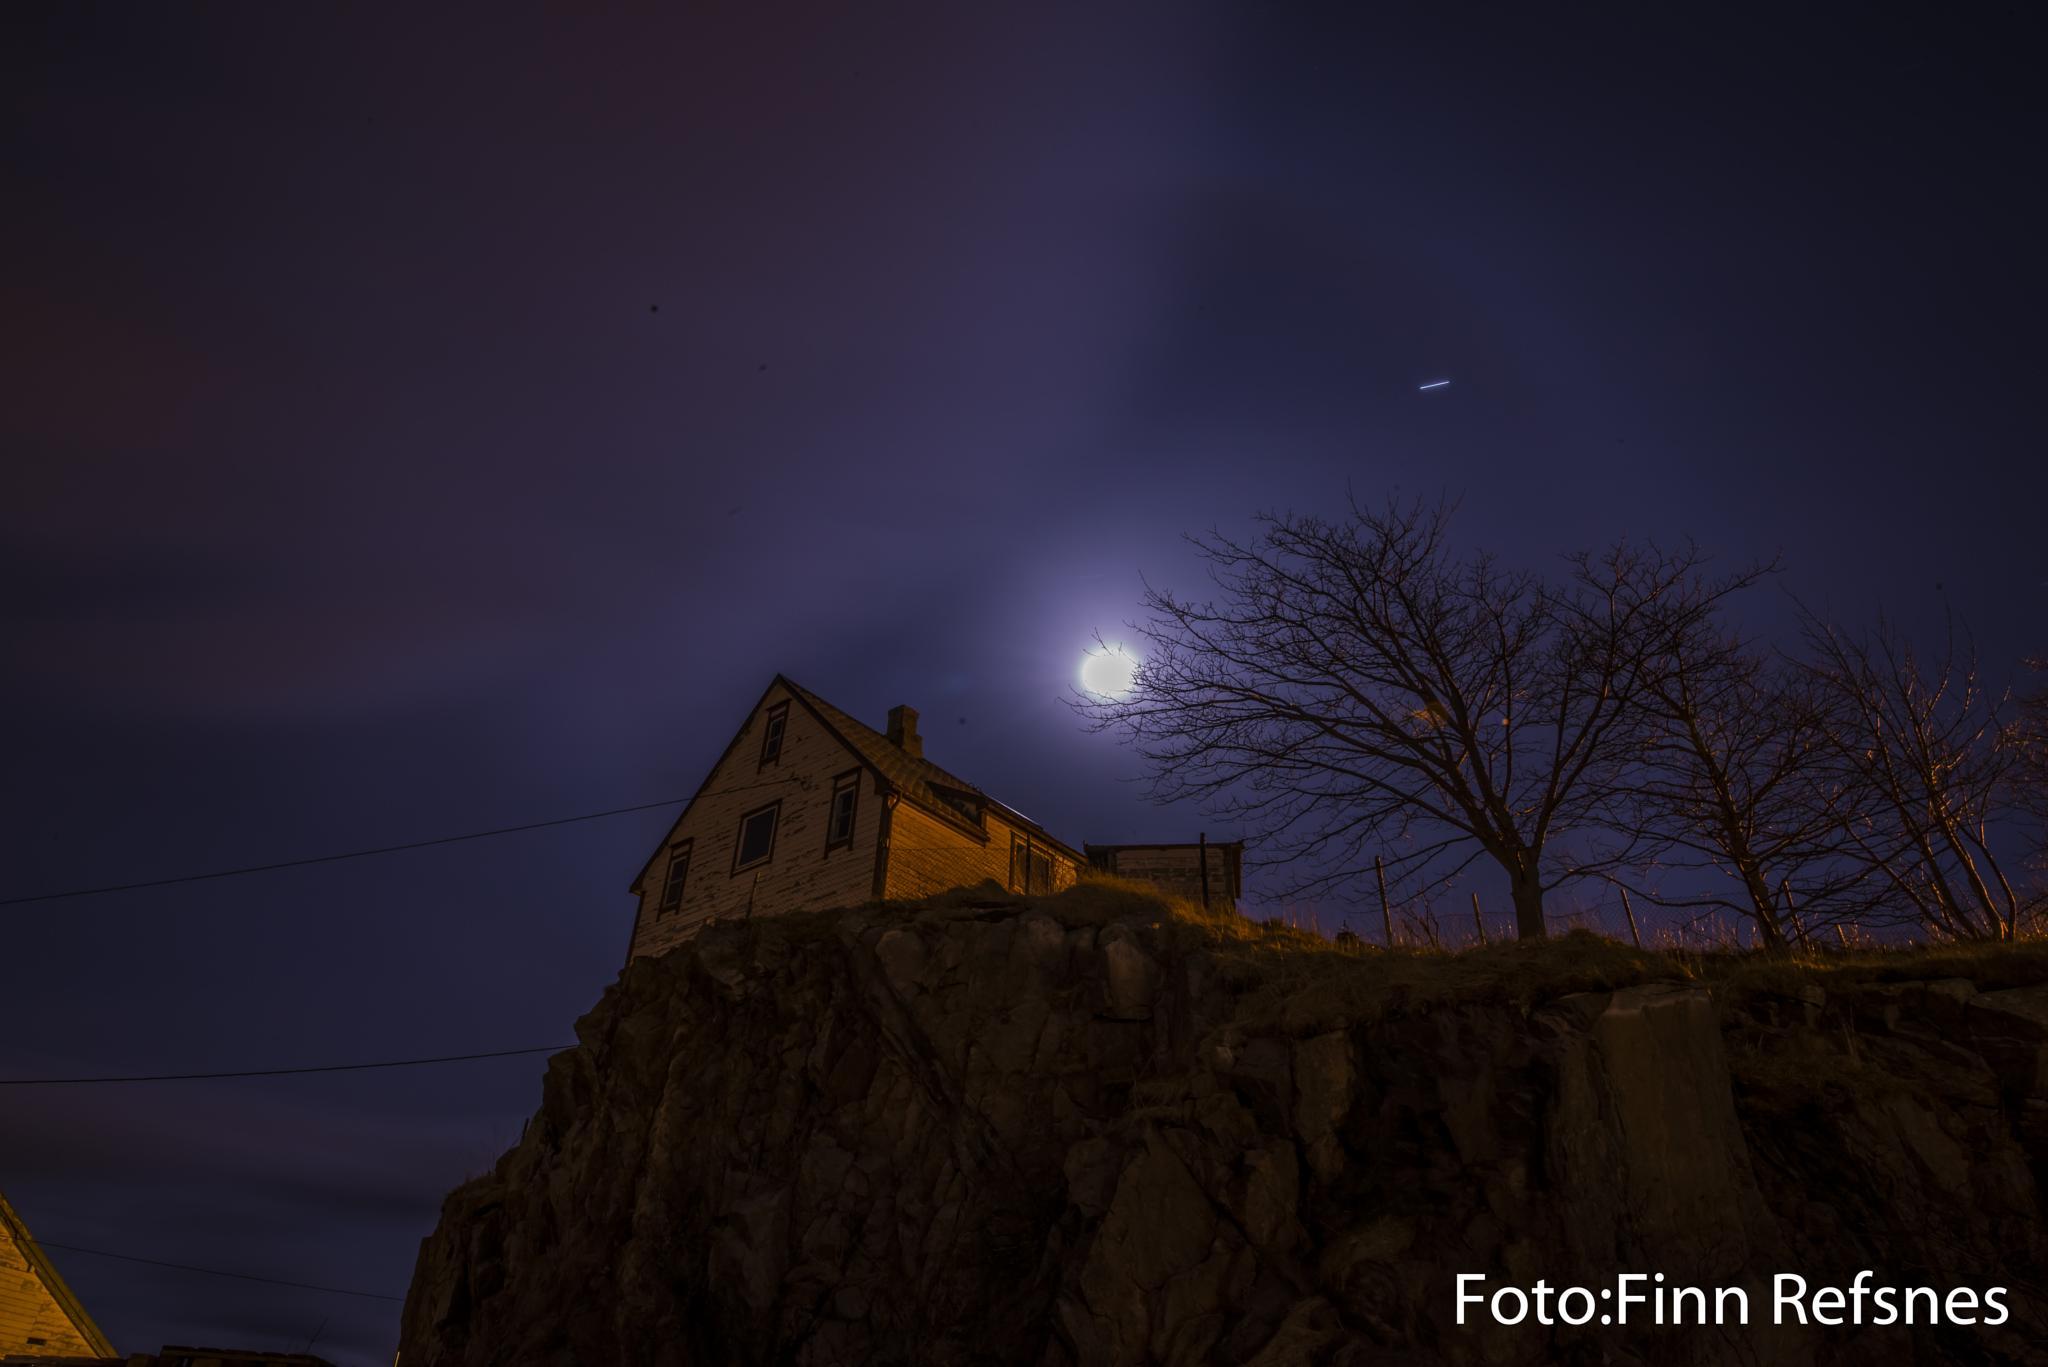 House on the hill by finn.refsnes